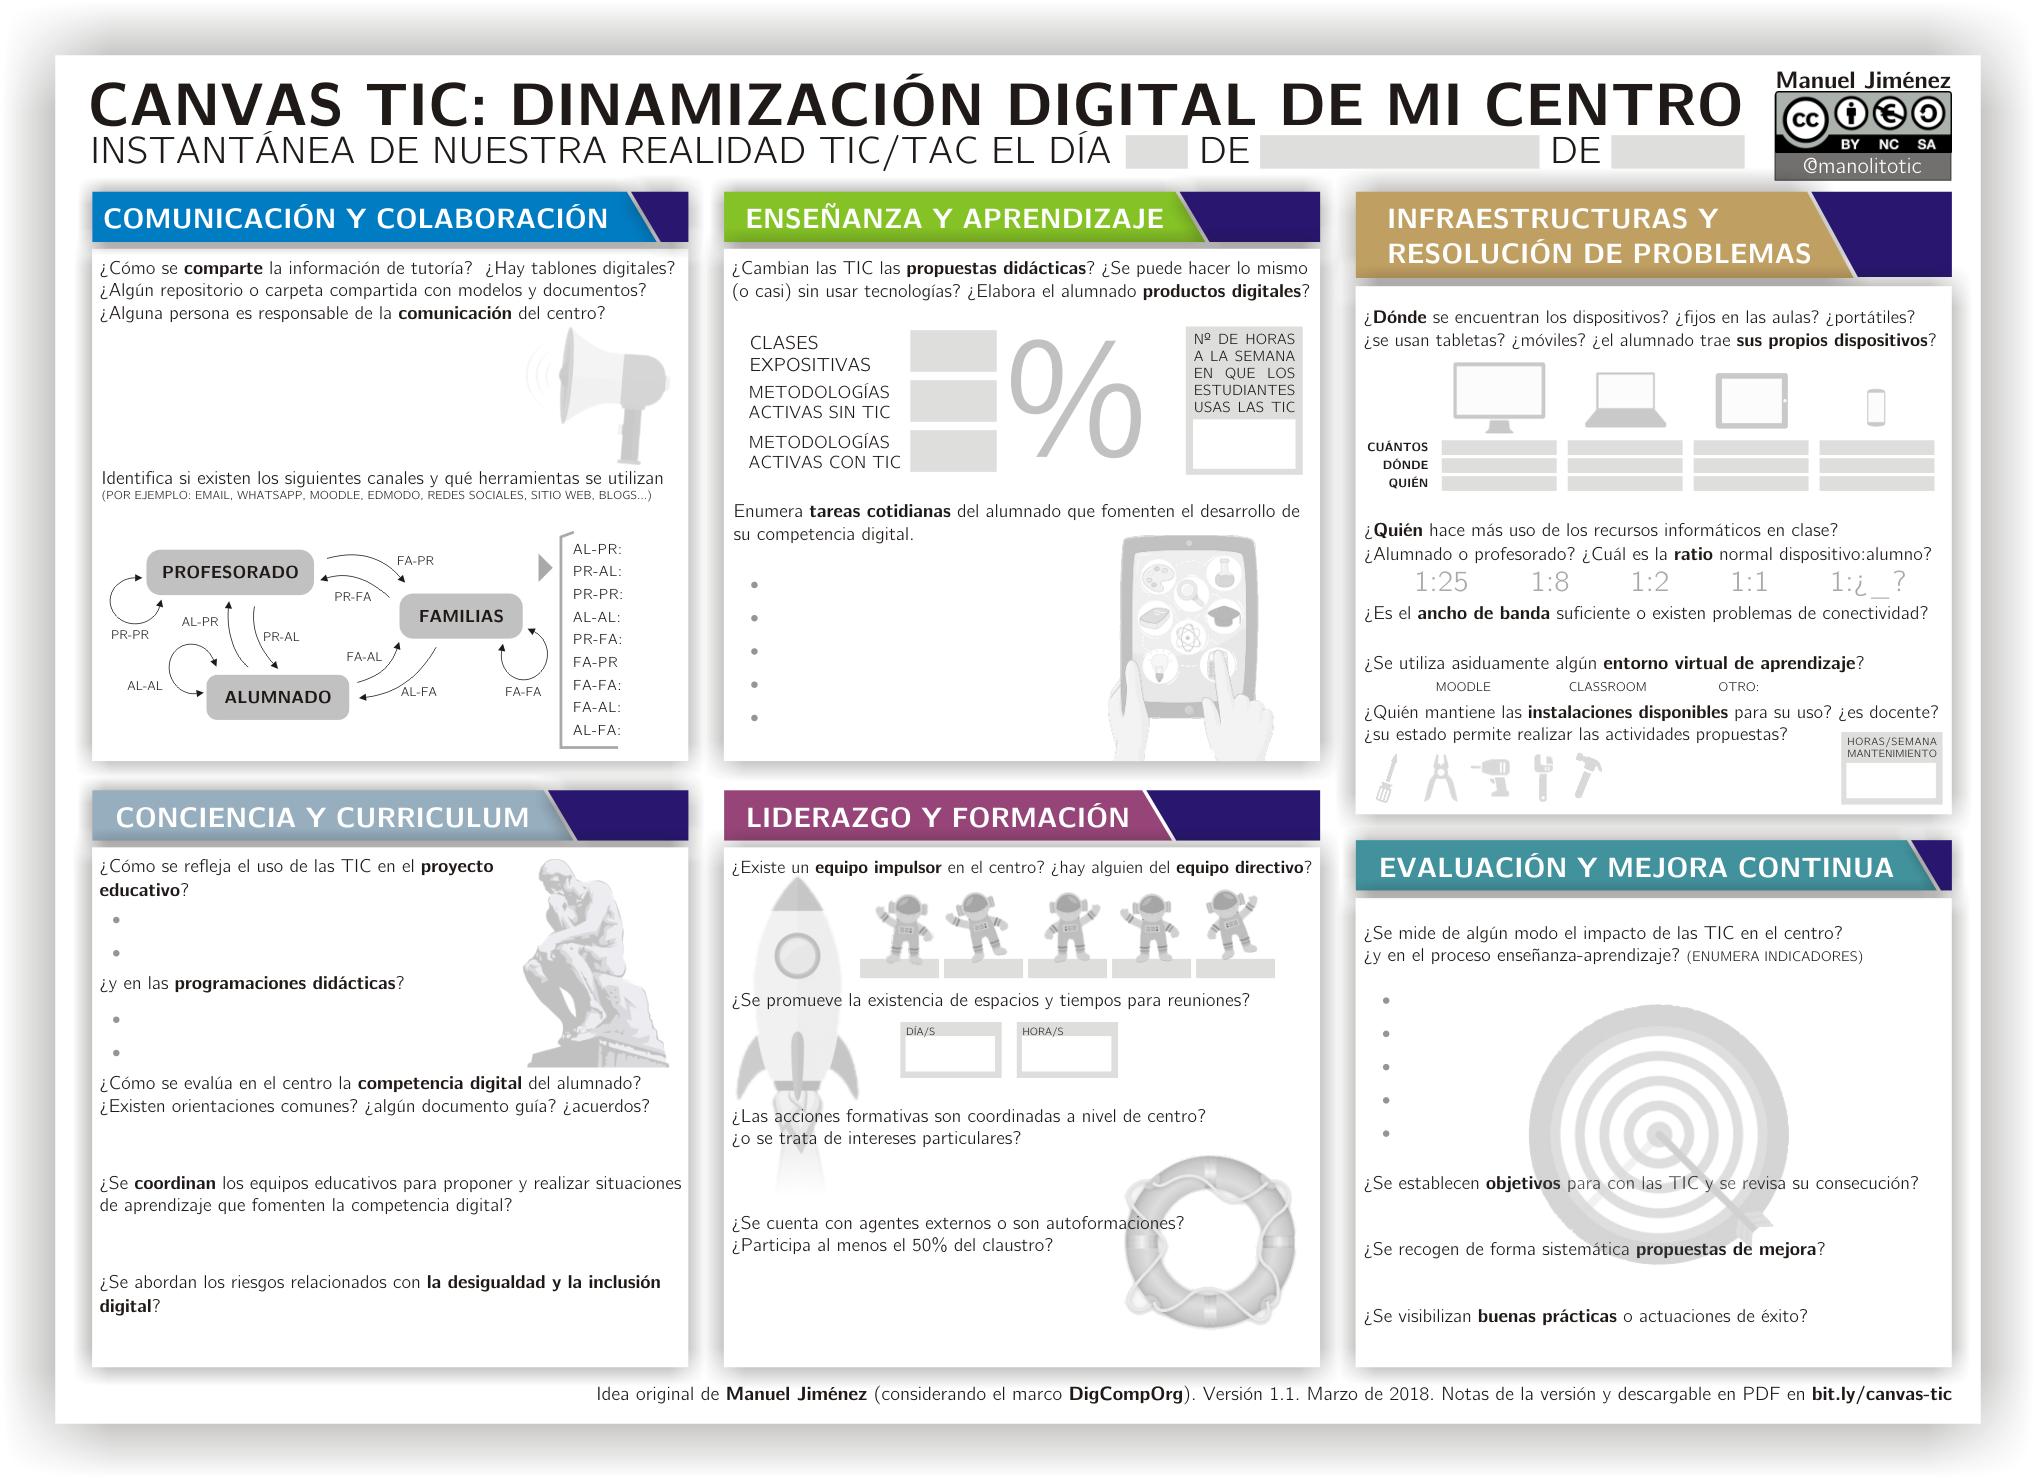 Organizador gráfico para recoger información e identificar las ...